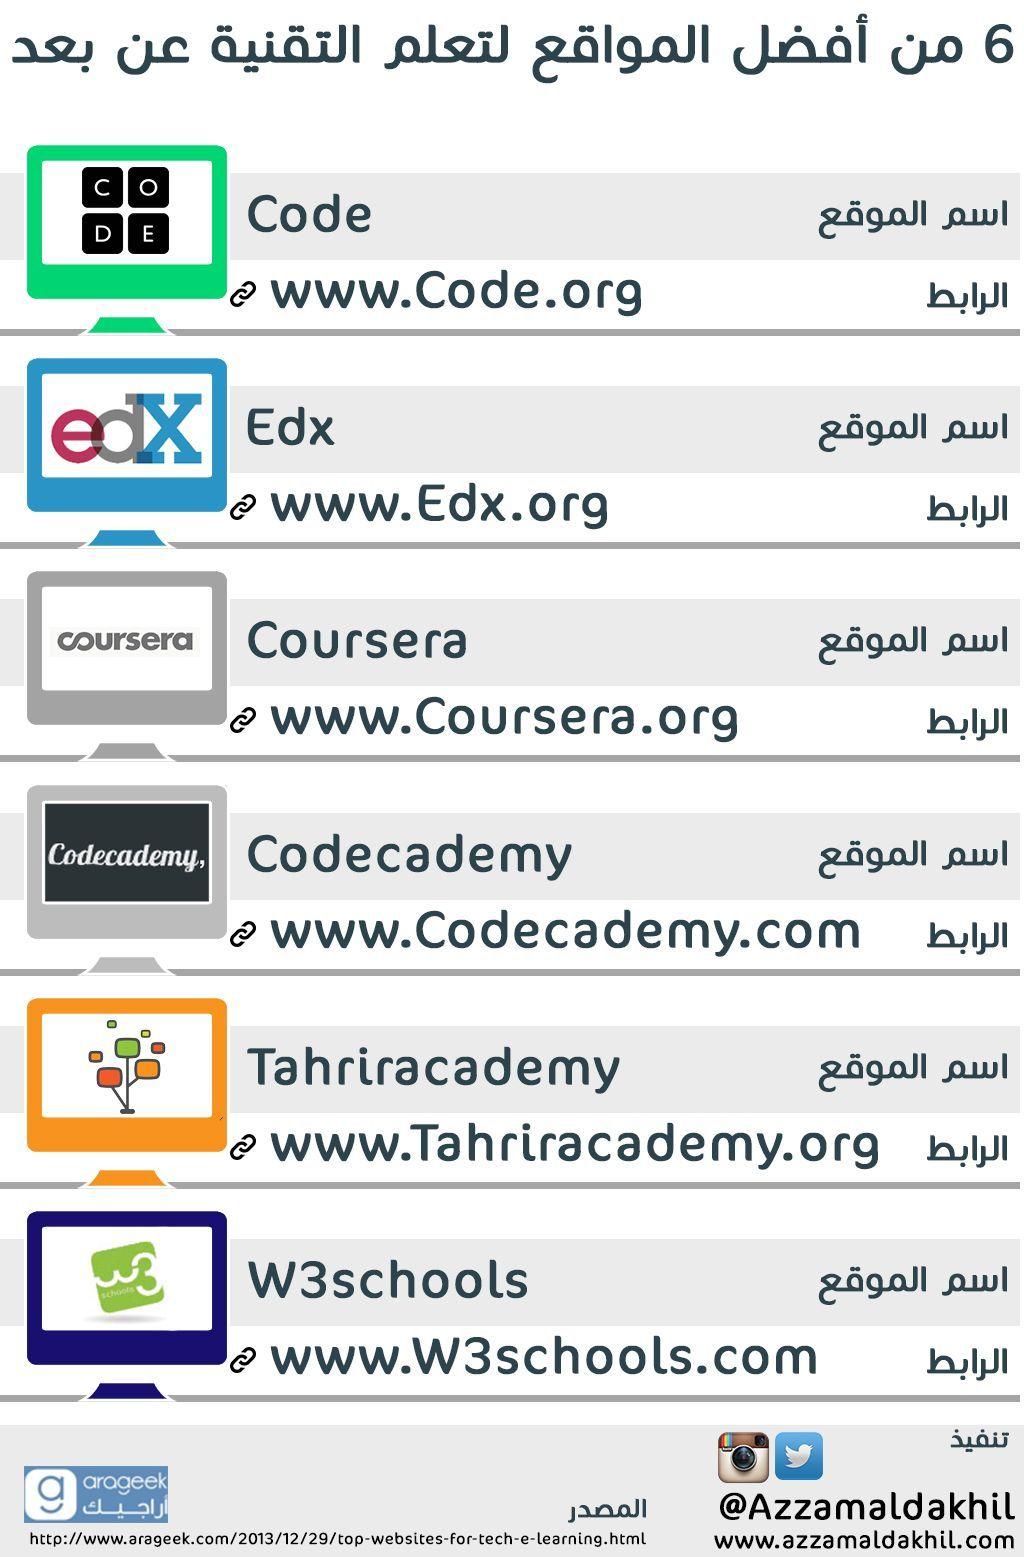 5e9042074edeb52babe617e4ed9d8cea Jpg 1 024 1 557 Pixels Learning Websites Education Application Programming Apps